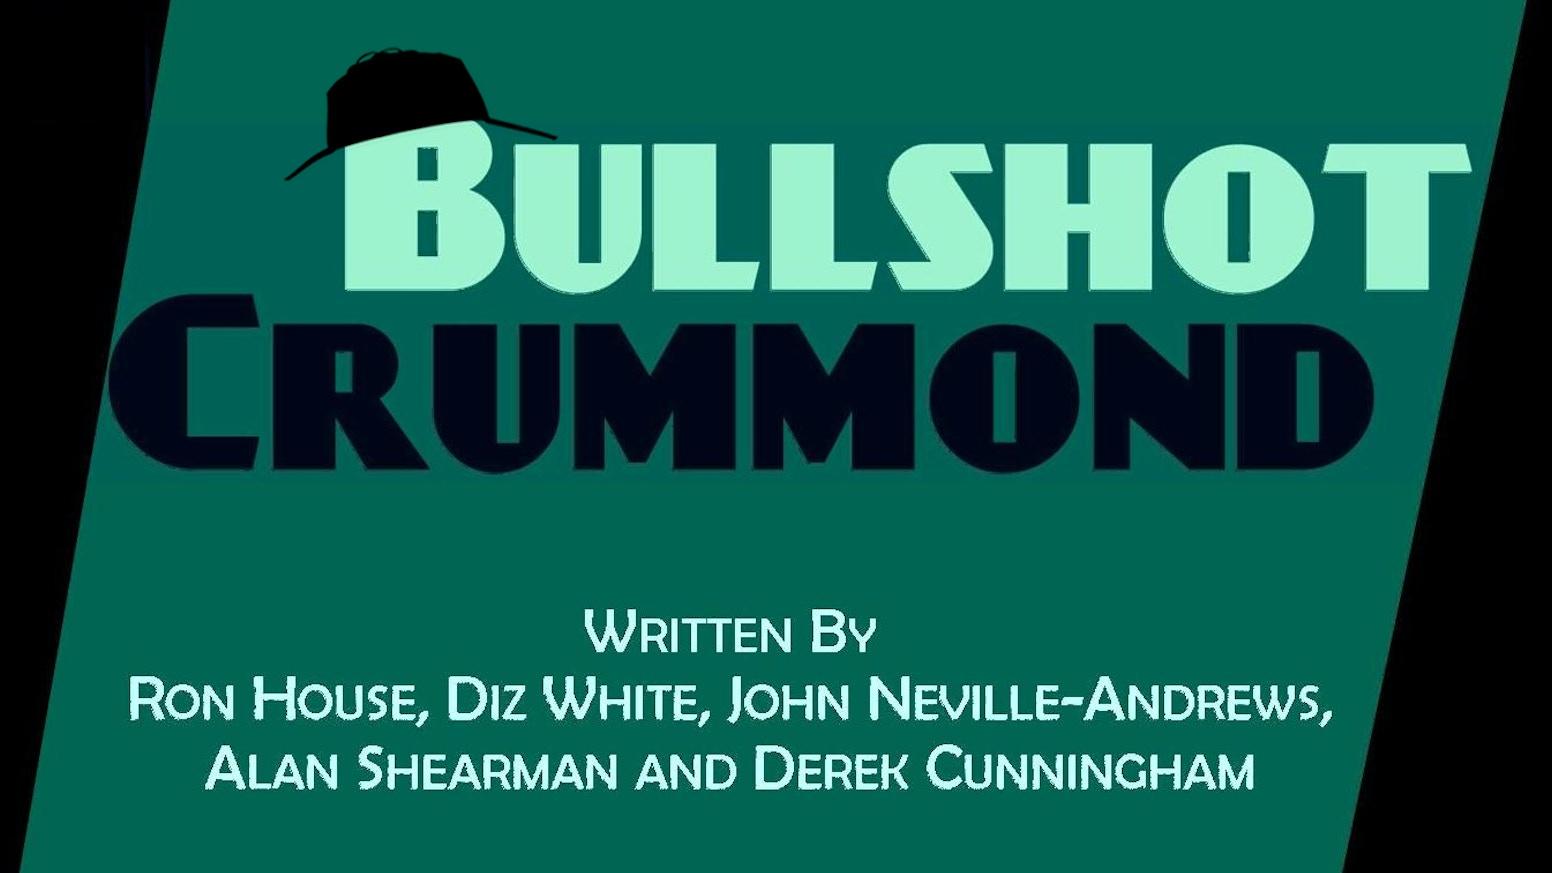 Acme Theatre Produces Bullshot Crummond By Acme Theatre Company